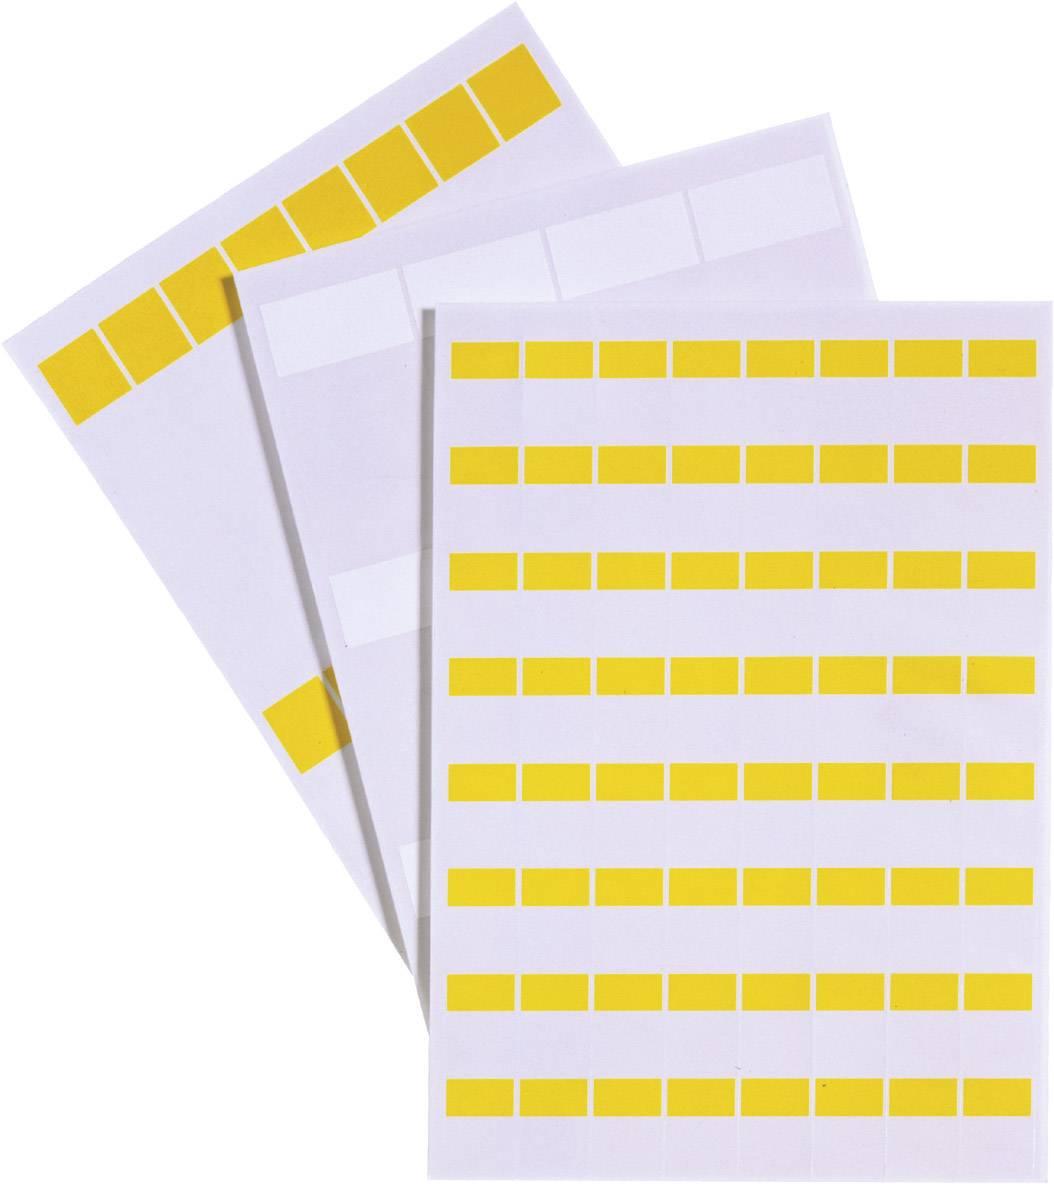 Etikety LappKabel LCK-48 WH (83256160), bílá